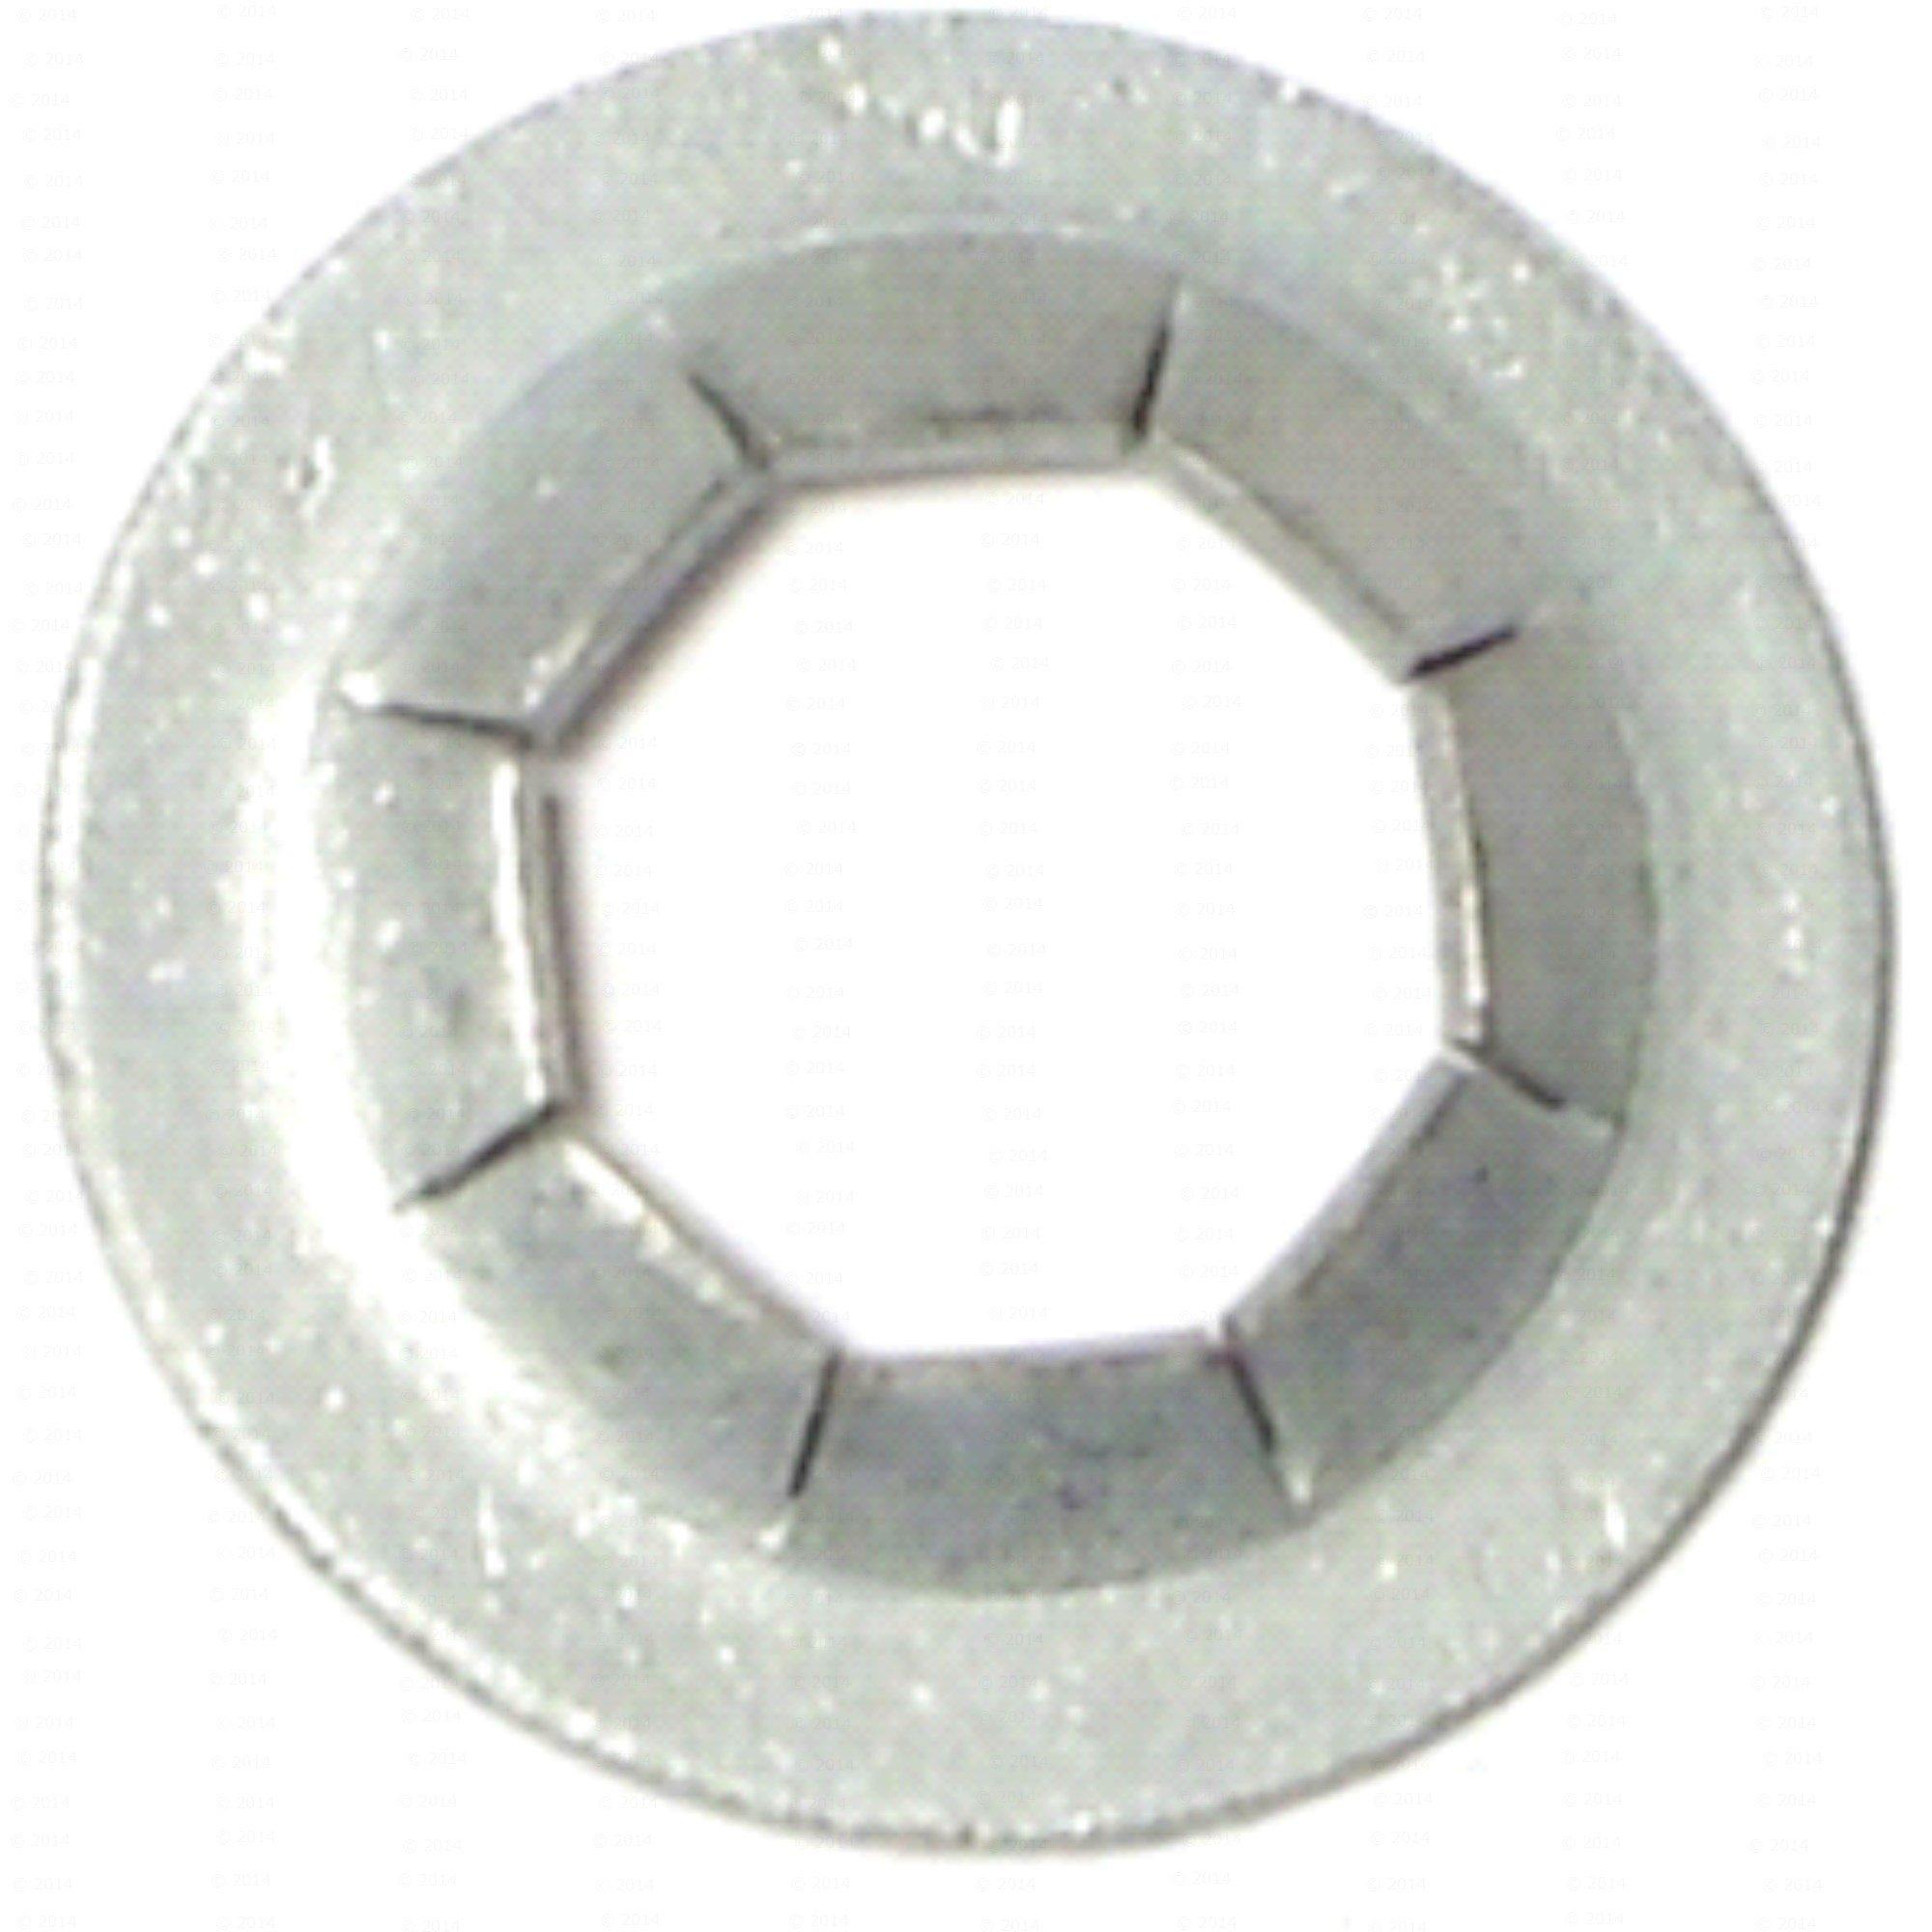 Hard-to-Find Fastener 014973244767 Fibre Washers, 3/8 x 7/8, Piece-30 by Hard-to-Find Fastener